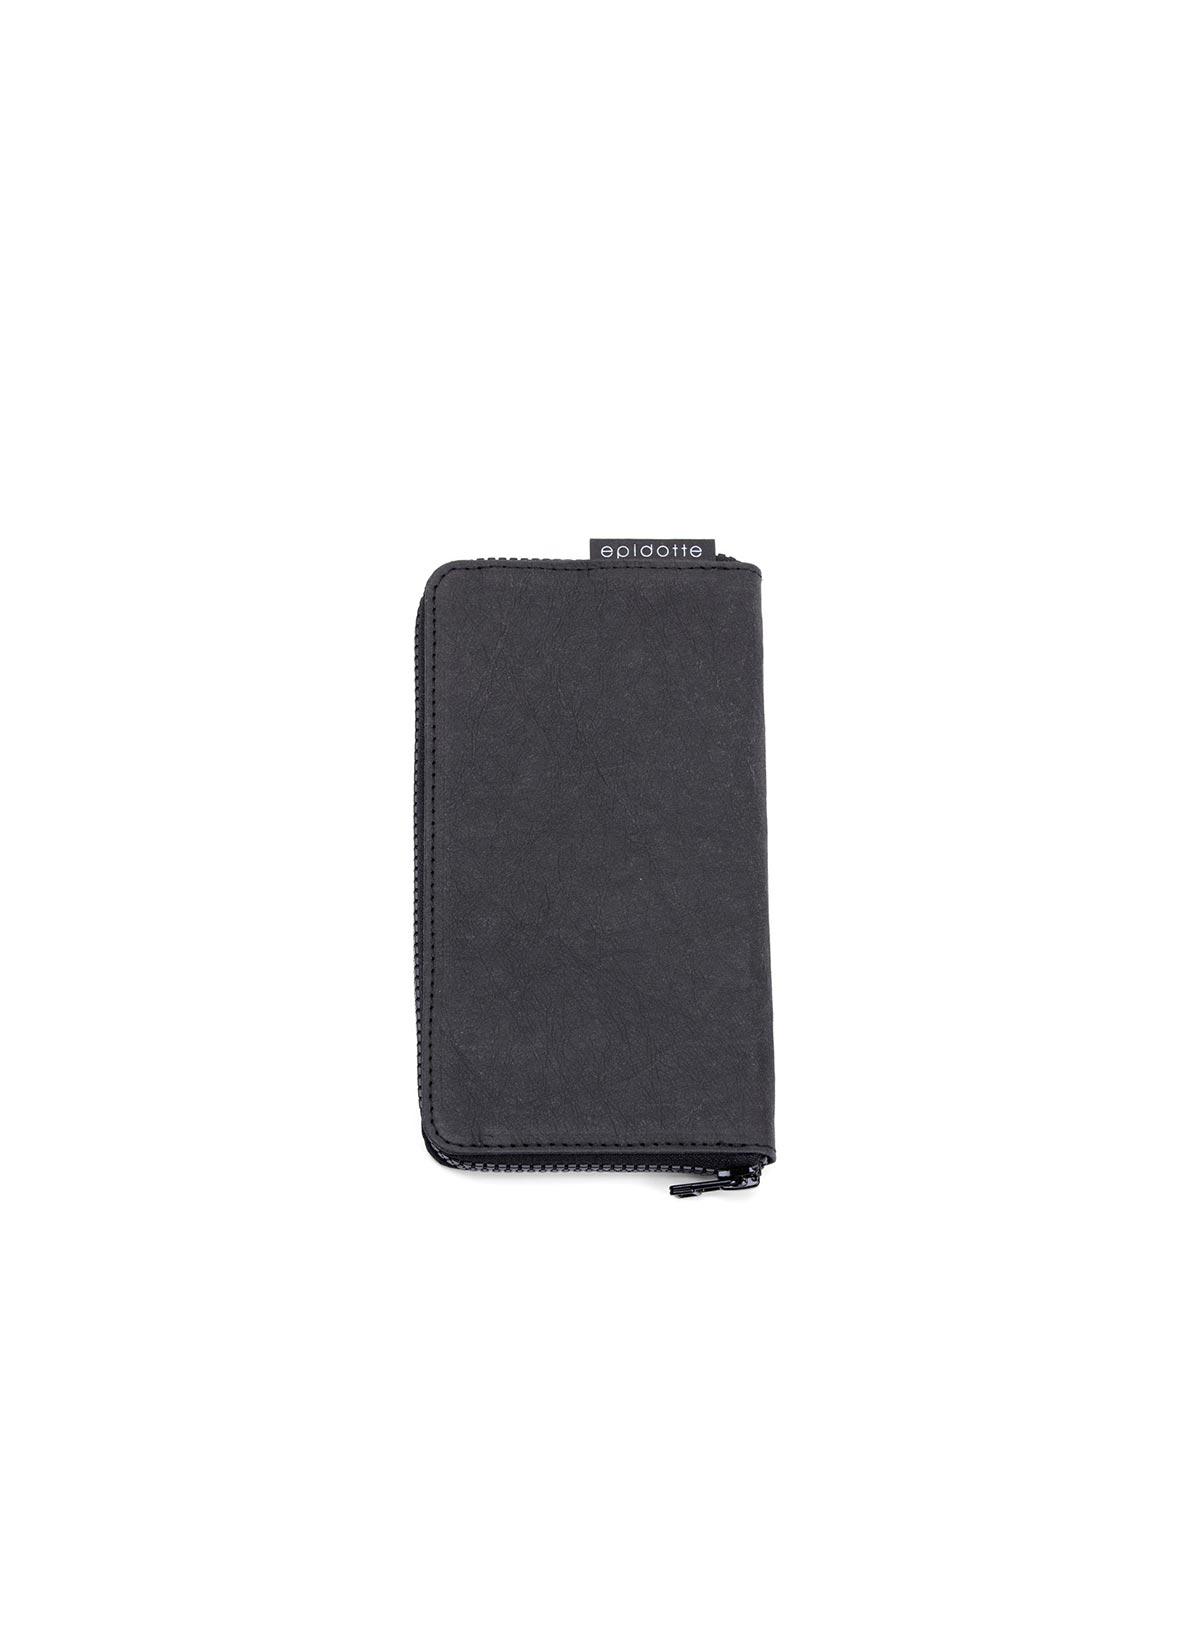 Zipped Wallet Black